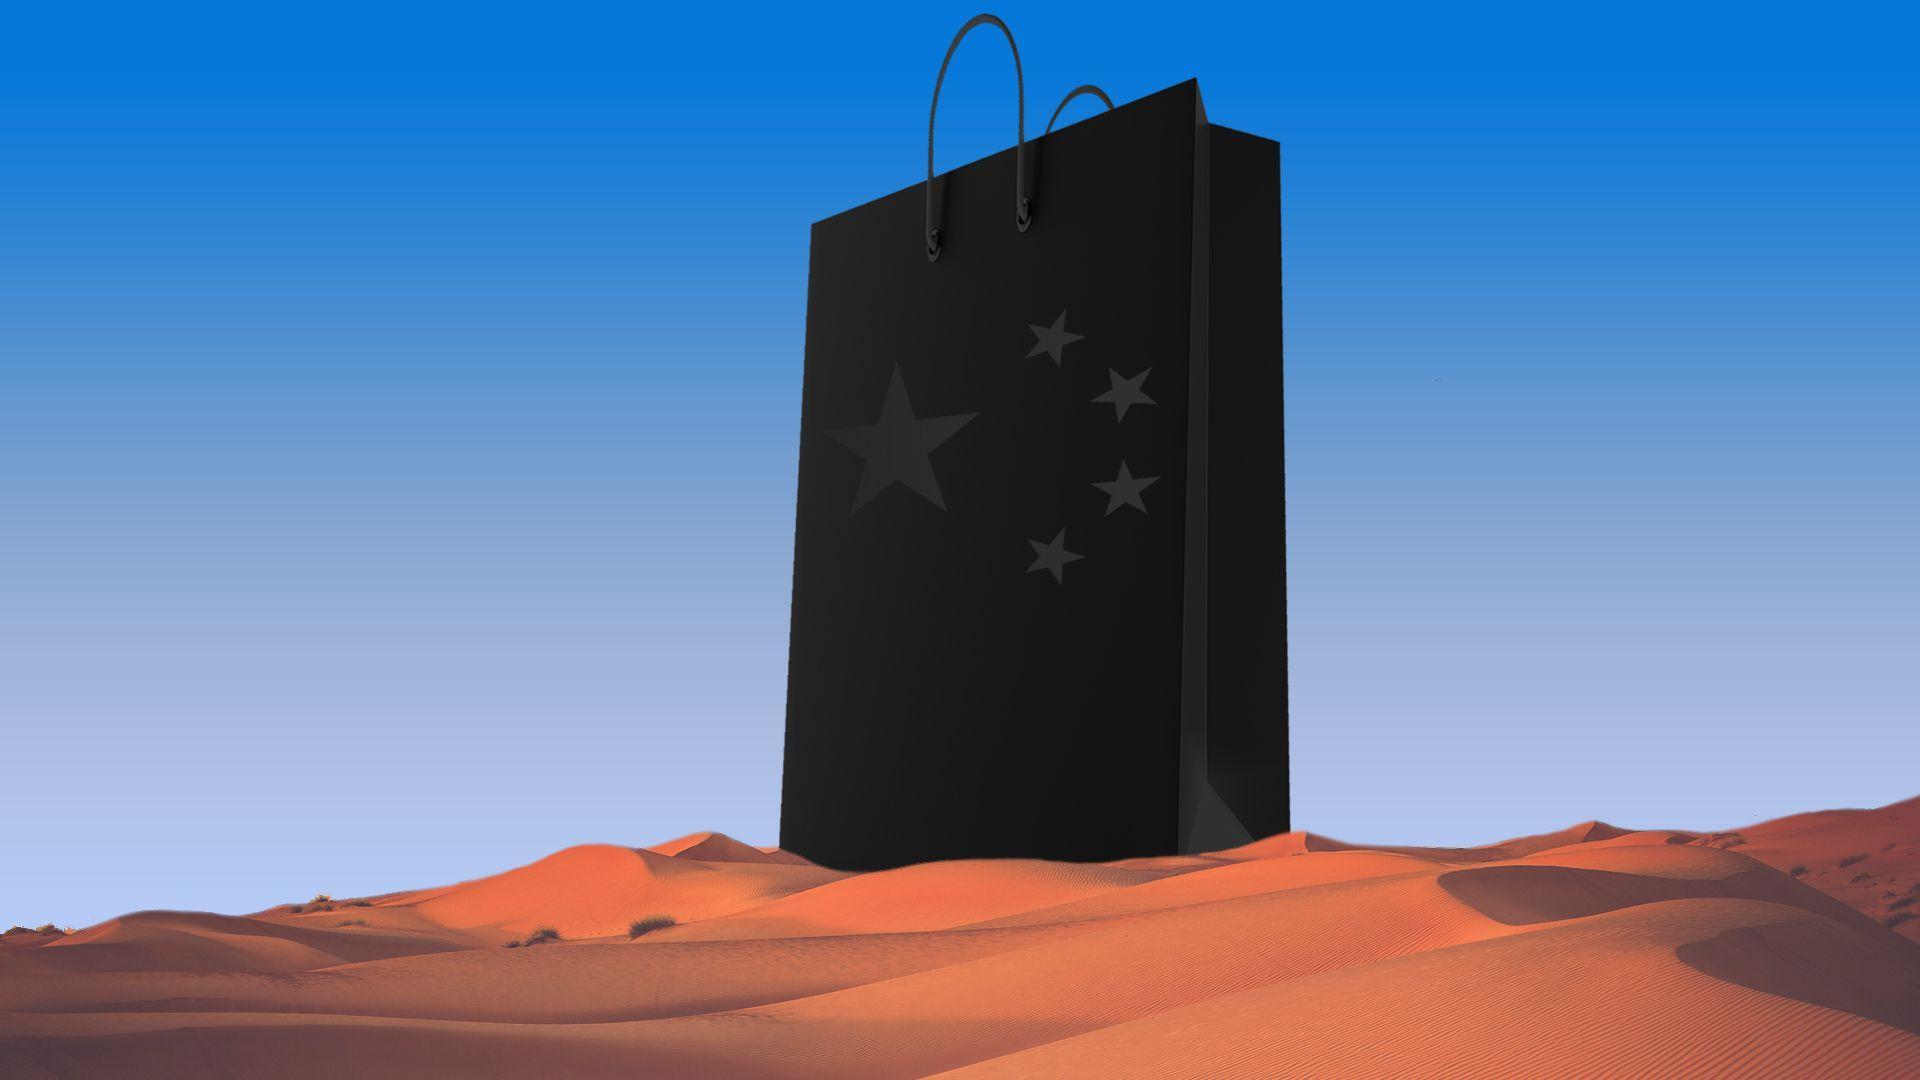 Illustration of bag with China stars